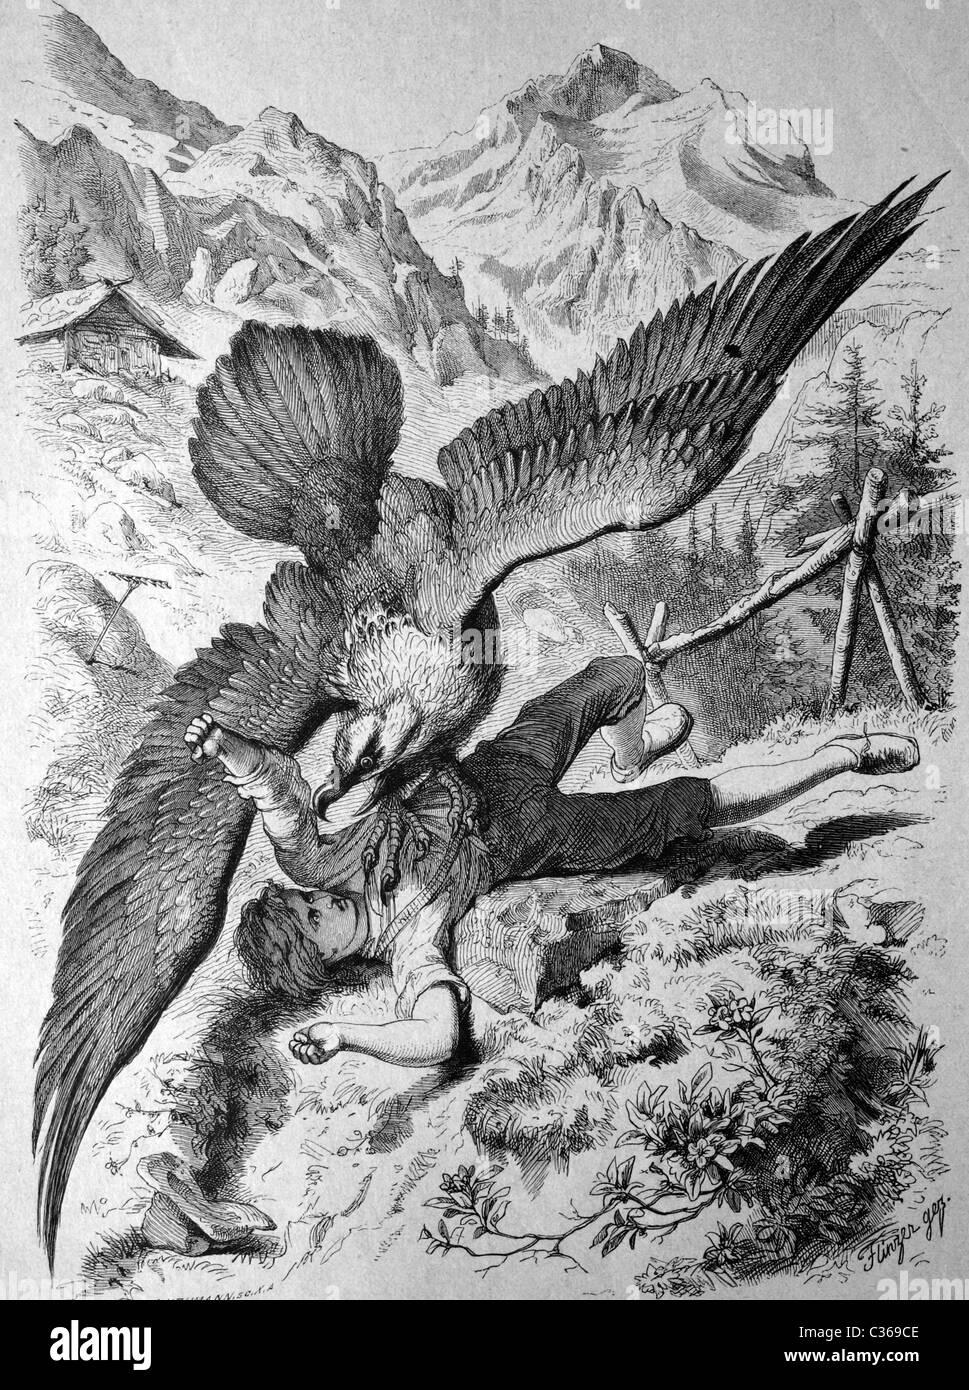 Vulture captures a boy, historical image 1886 - Stock Image